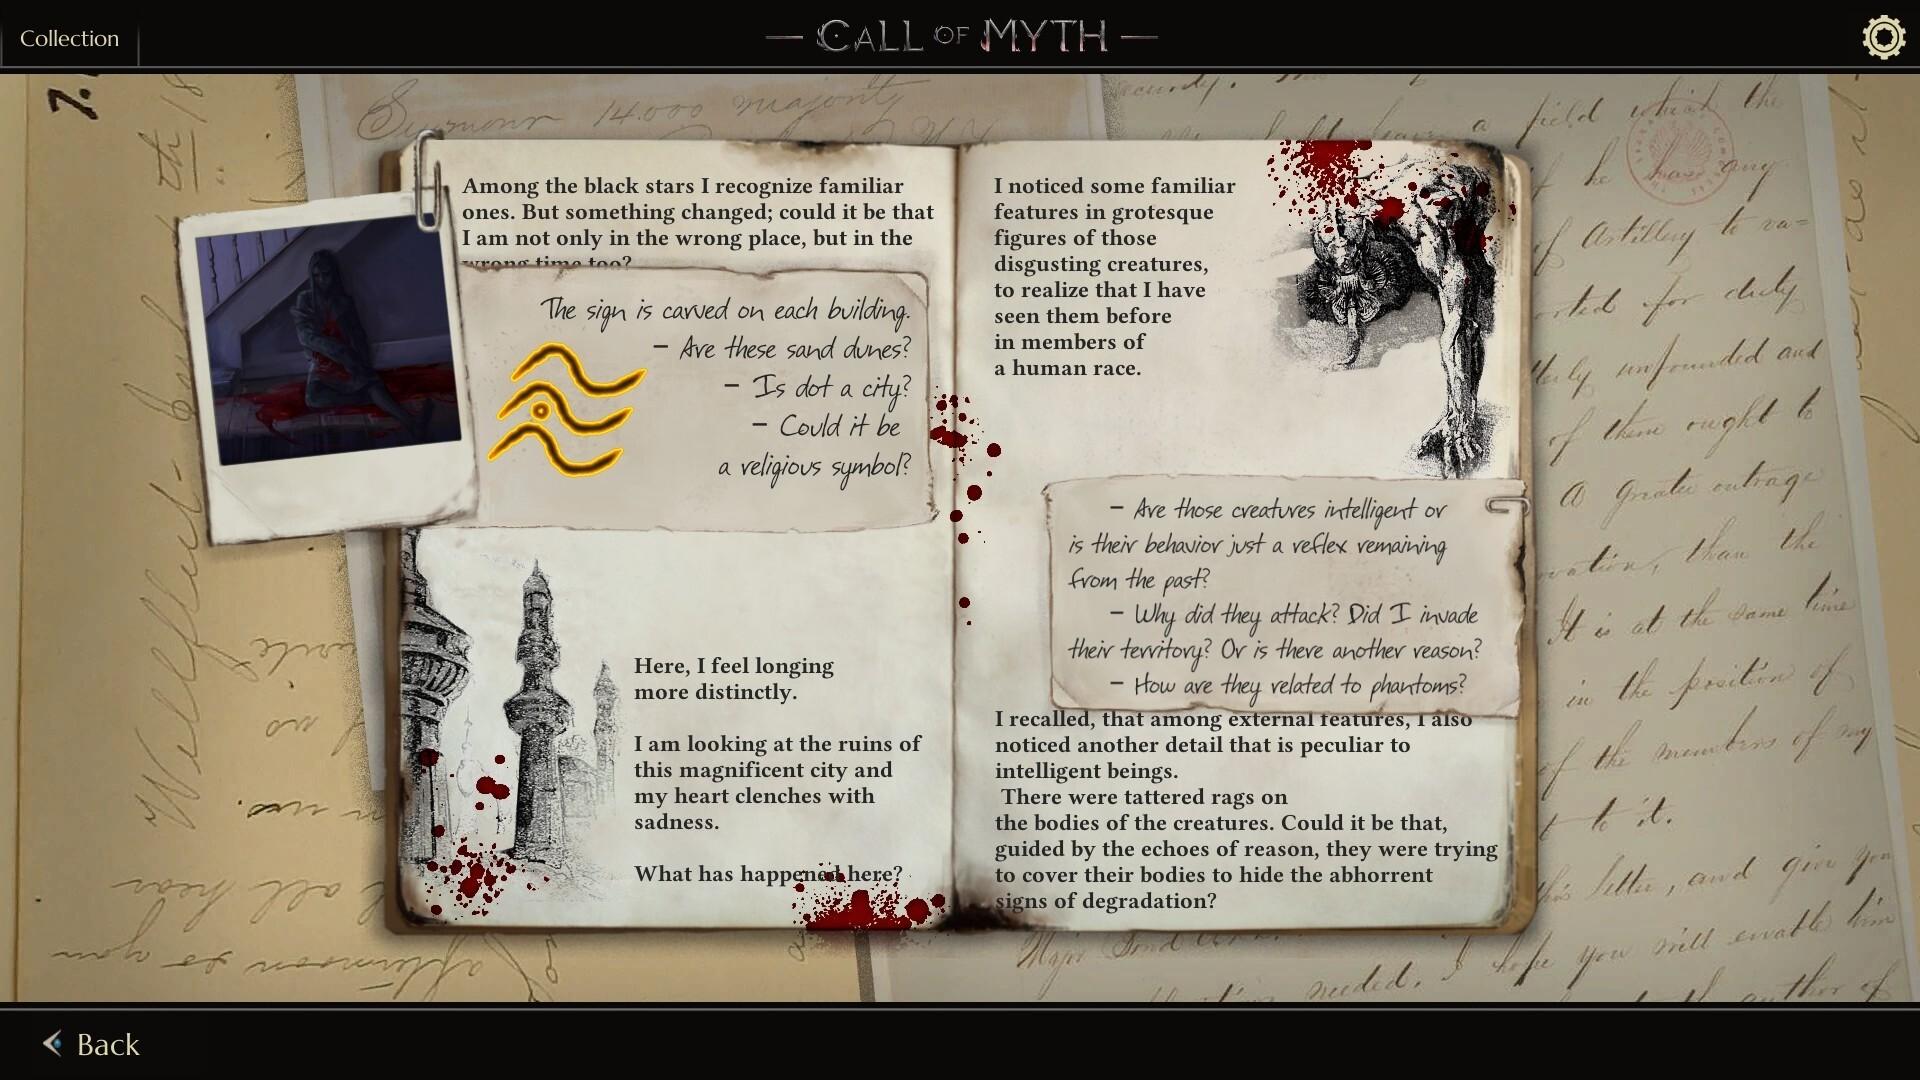 Call of Myth game screenshot, diary entry